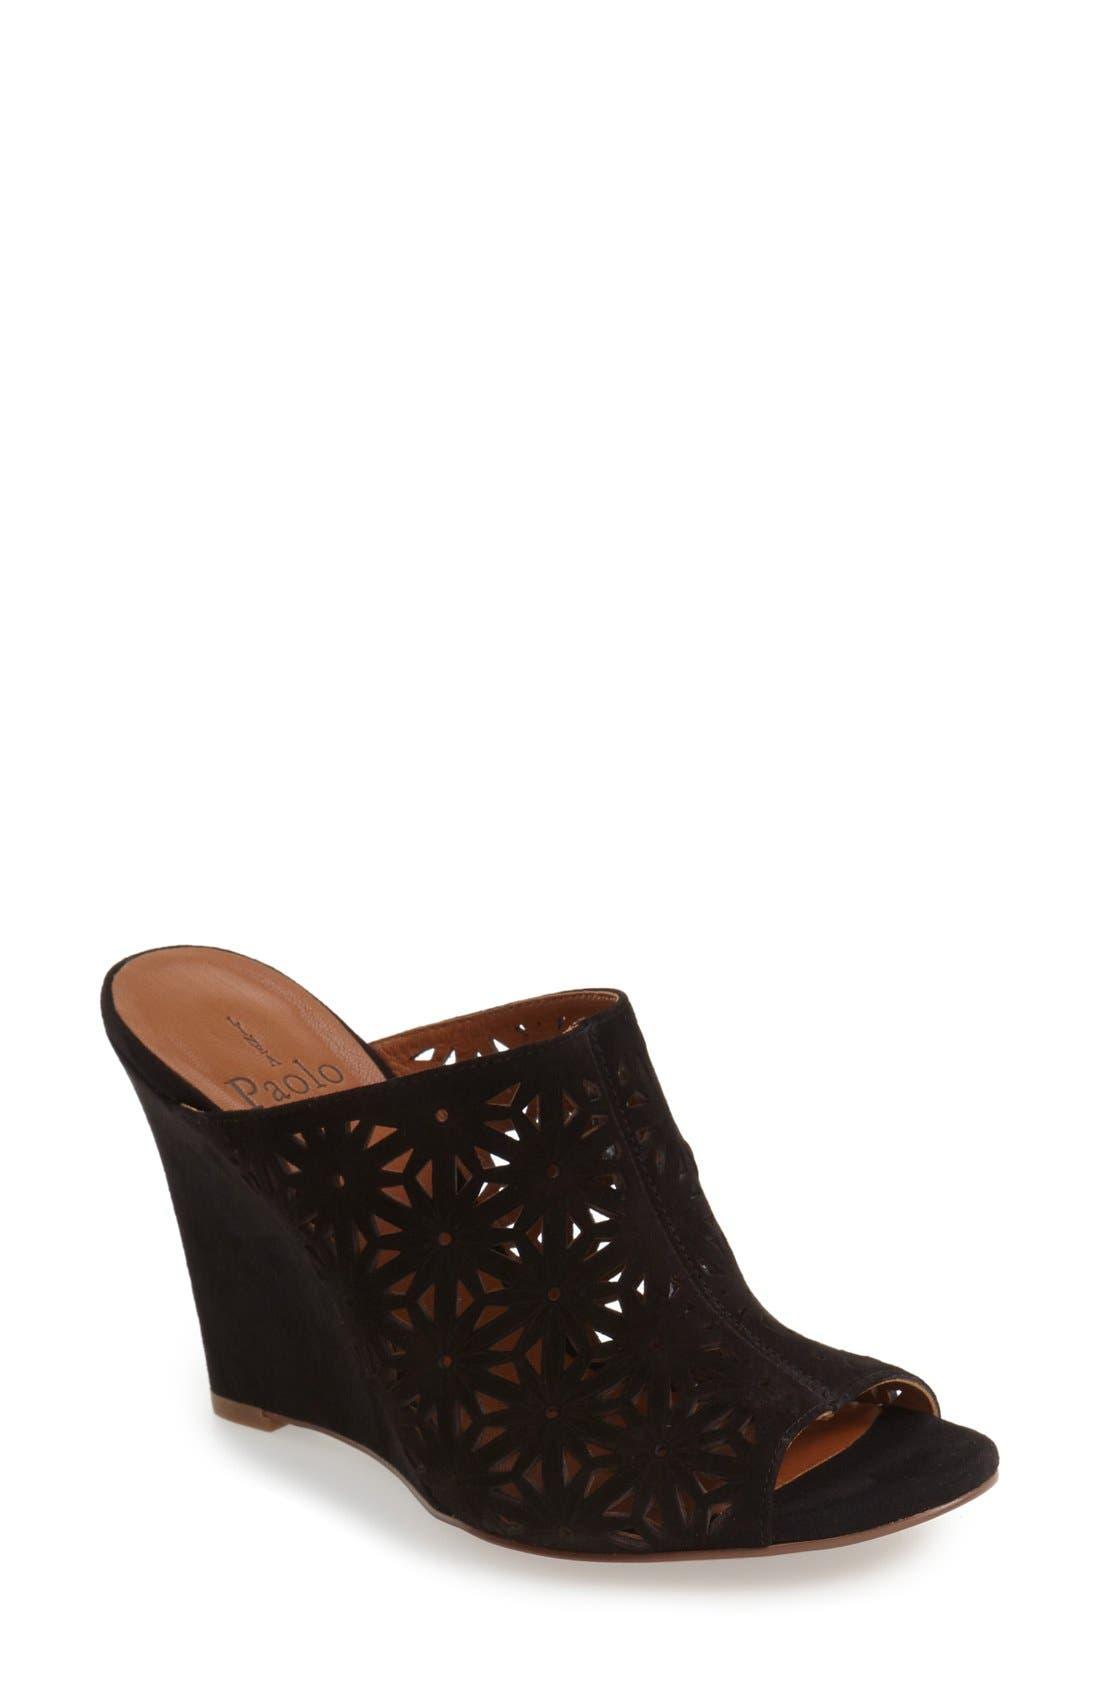 Alternate Image 1 Selected - Linea Paolo 'Wendy' Wedge Sandal (Women)